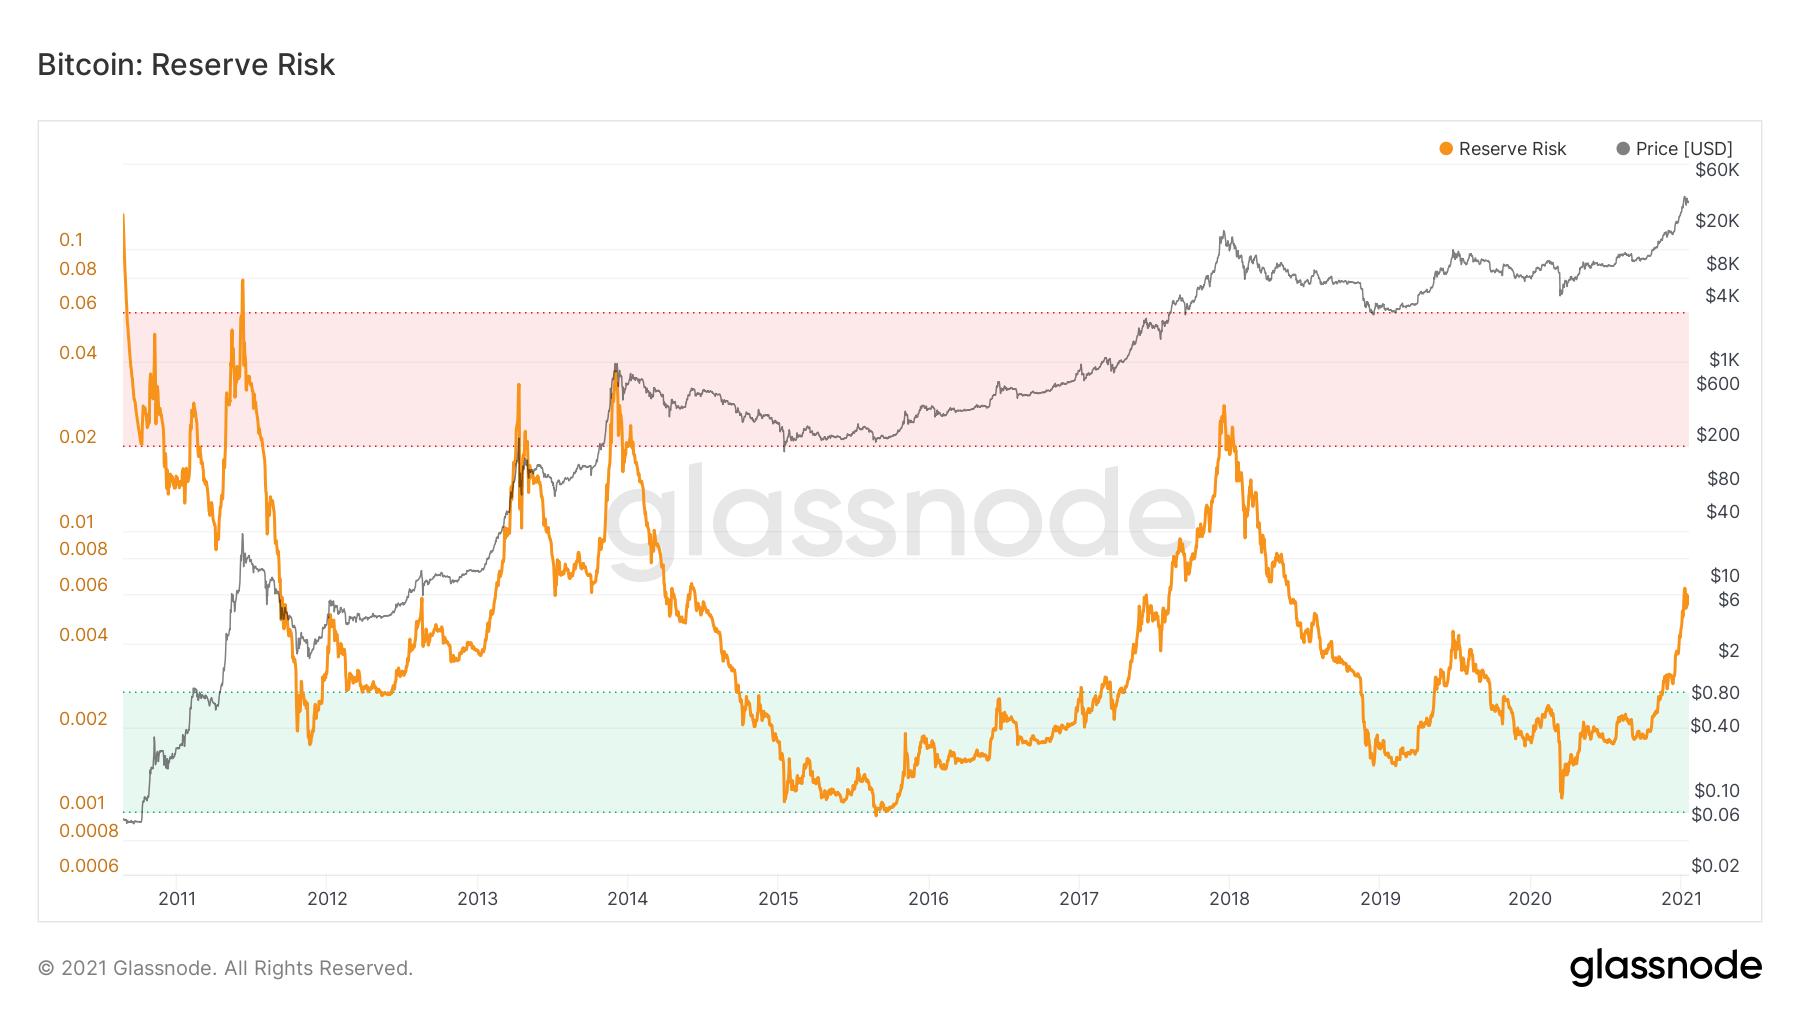 Bitcoin Reserve Risk chart